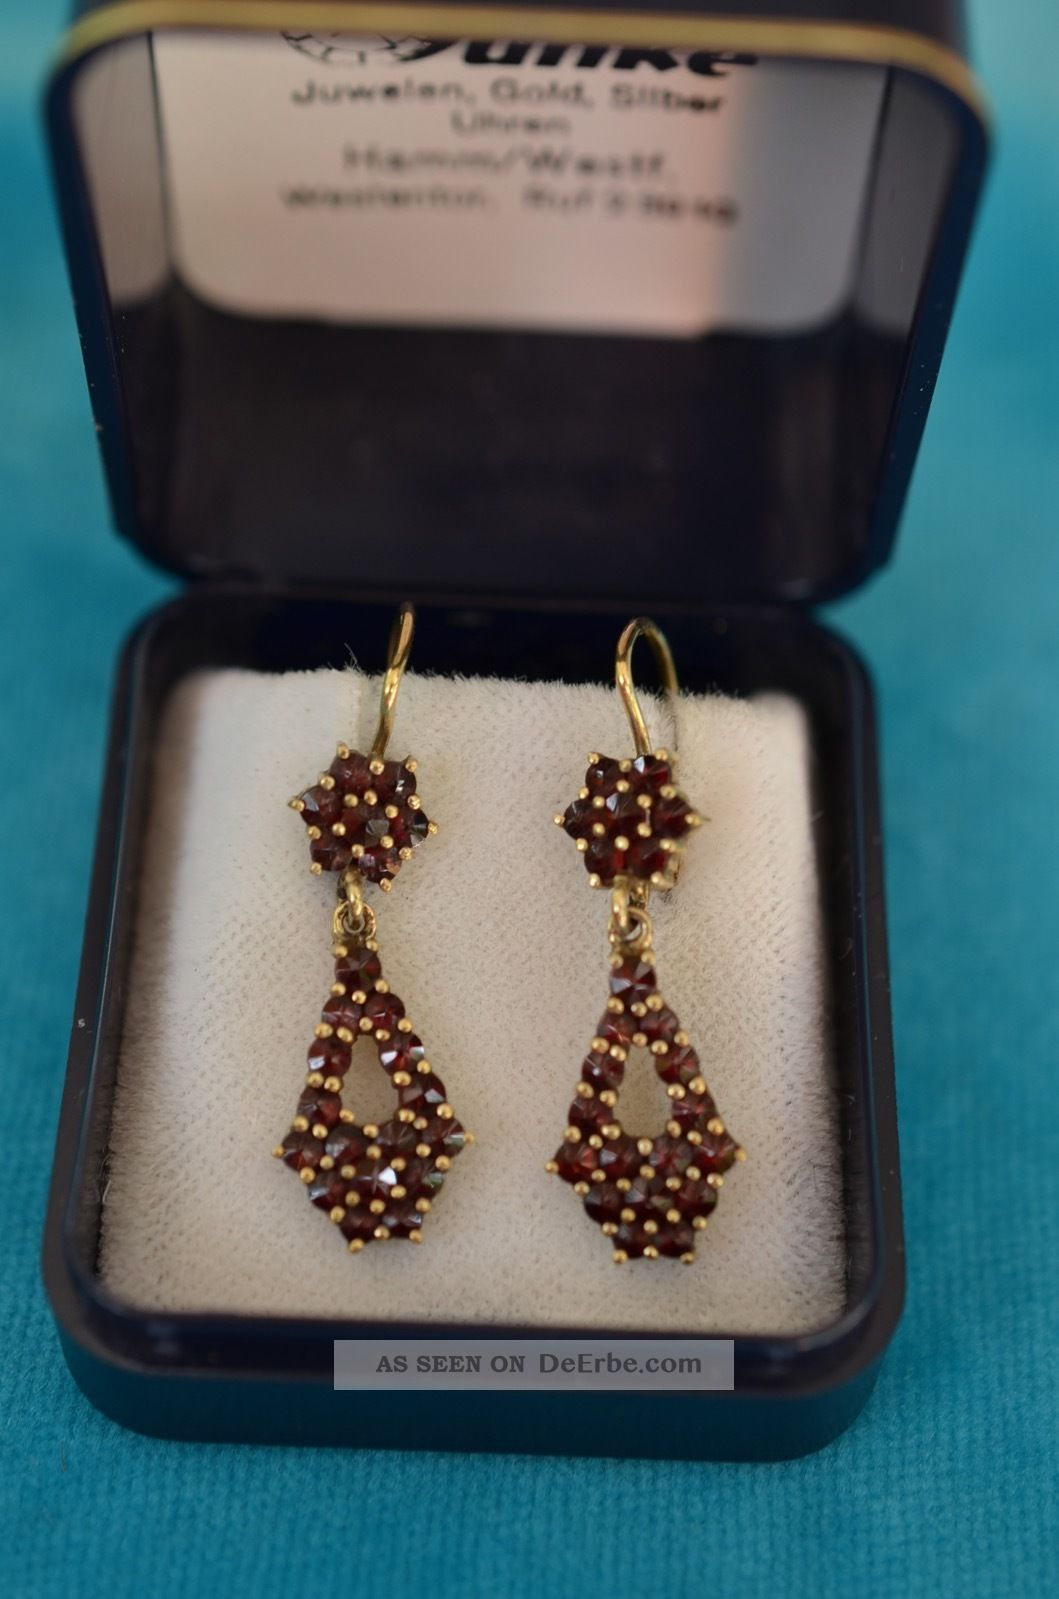 Schne Ausgefallene Granat Ohrringe Ohrschmuck Silber 900 Vergoldet